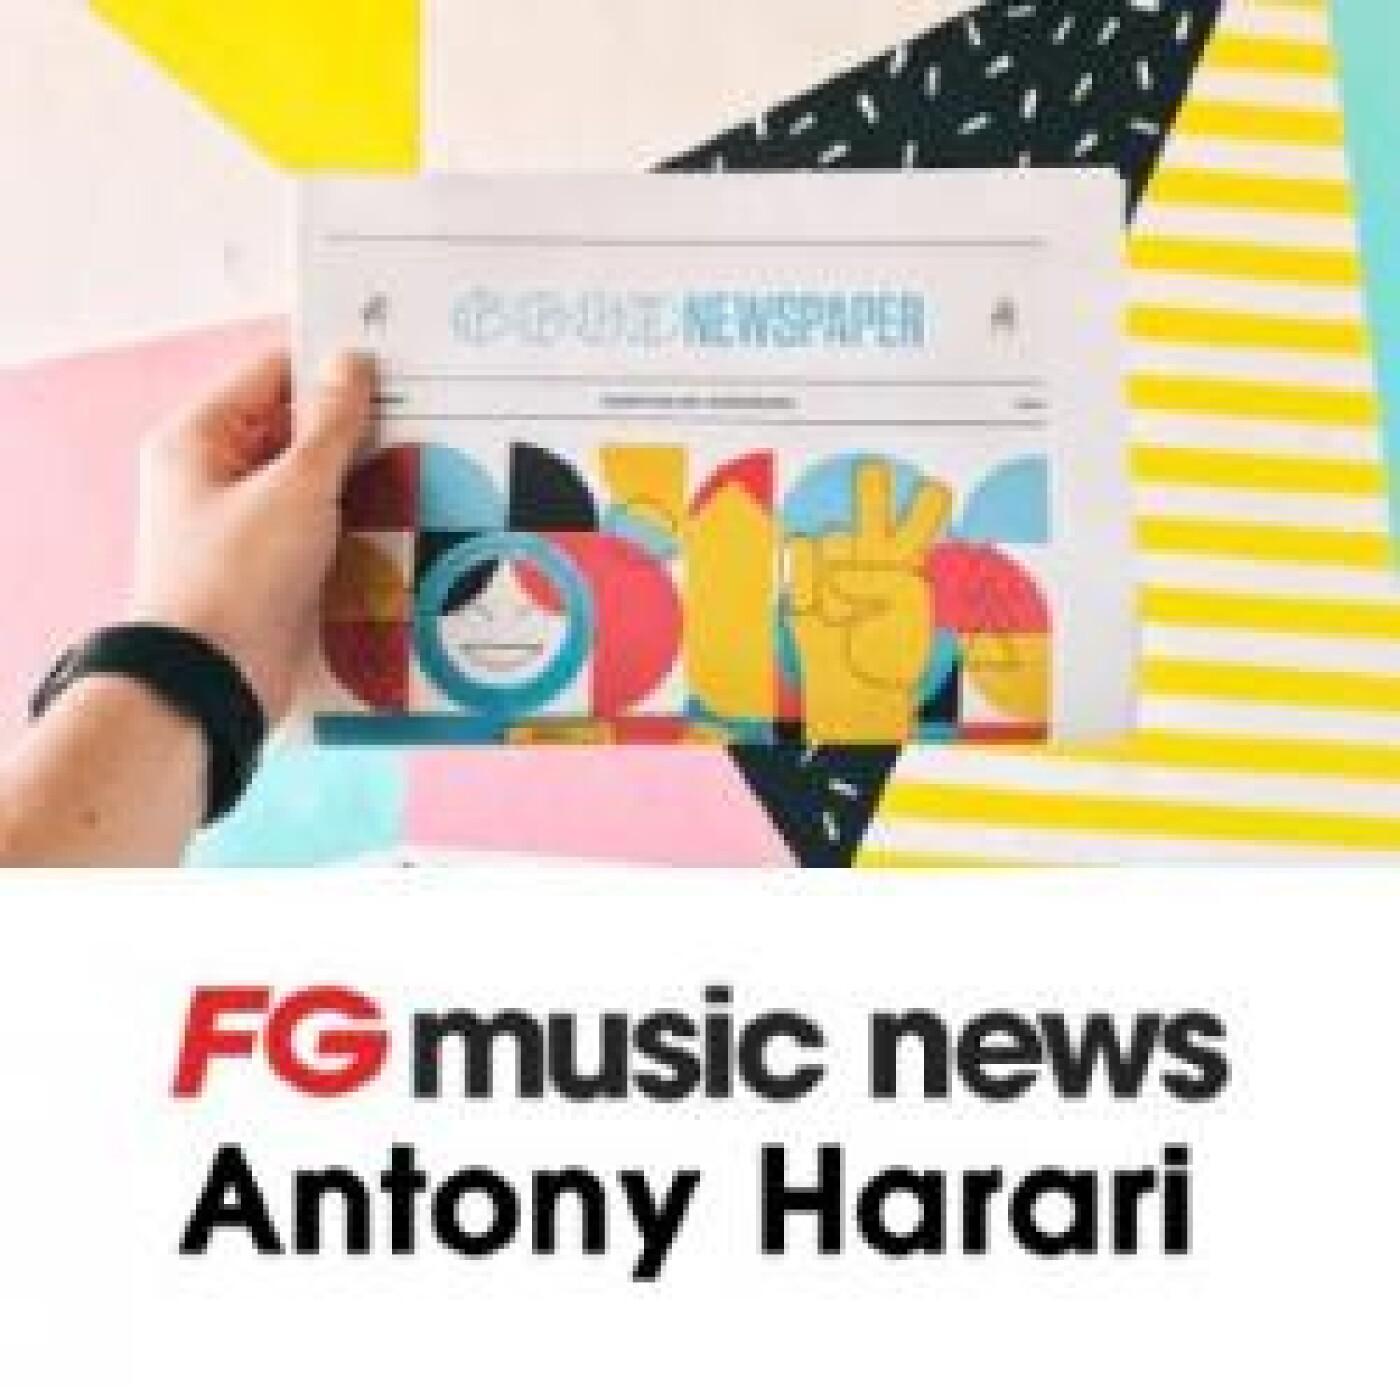 FG MUSIC NEWS : Le nouveau John Modena